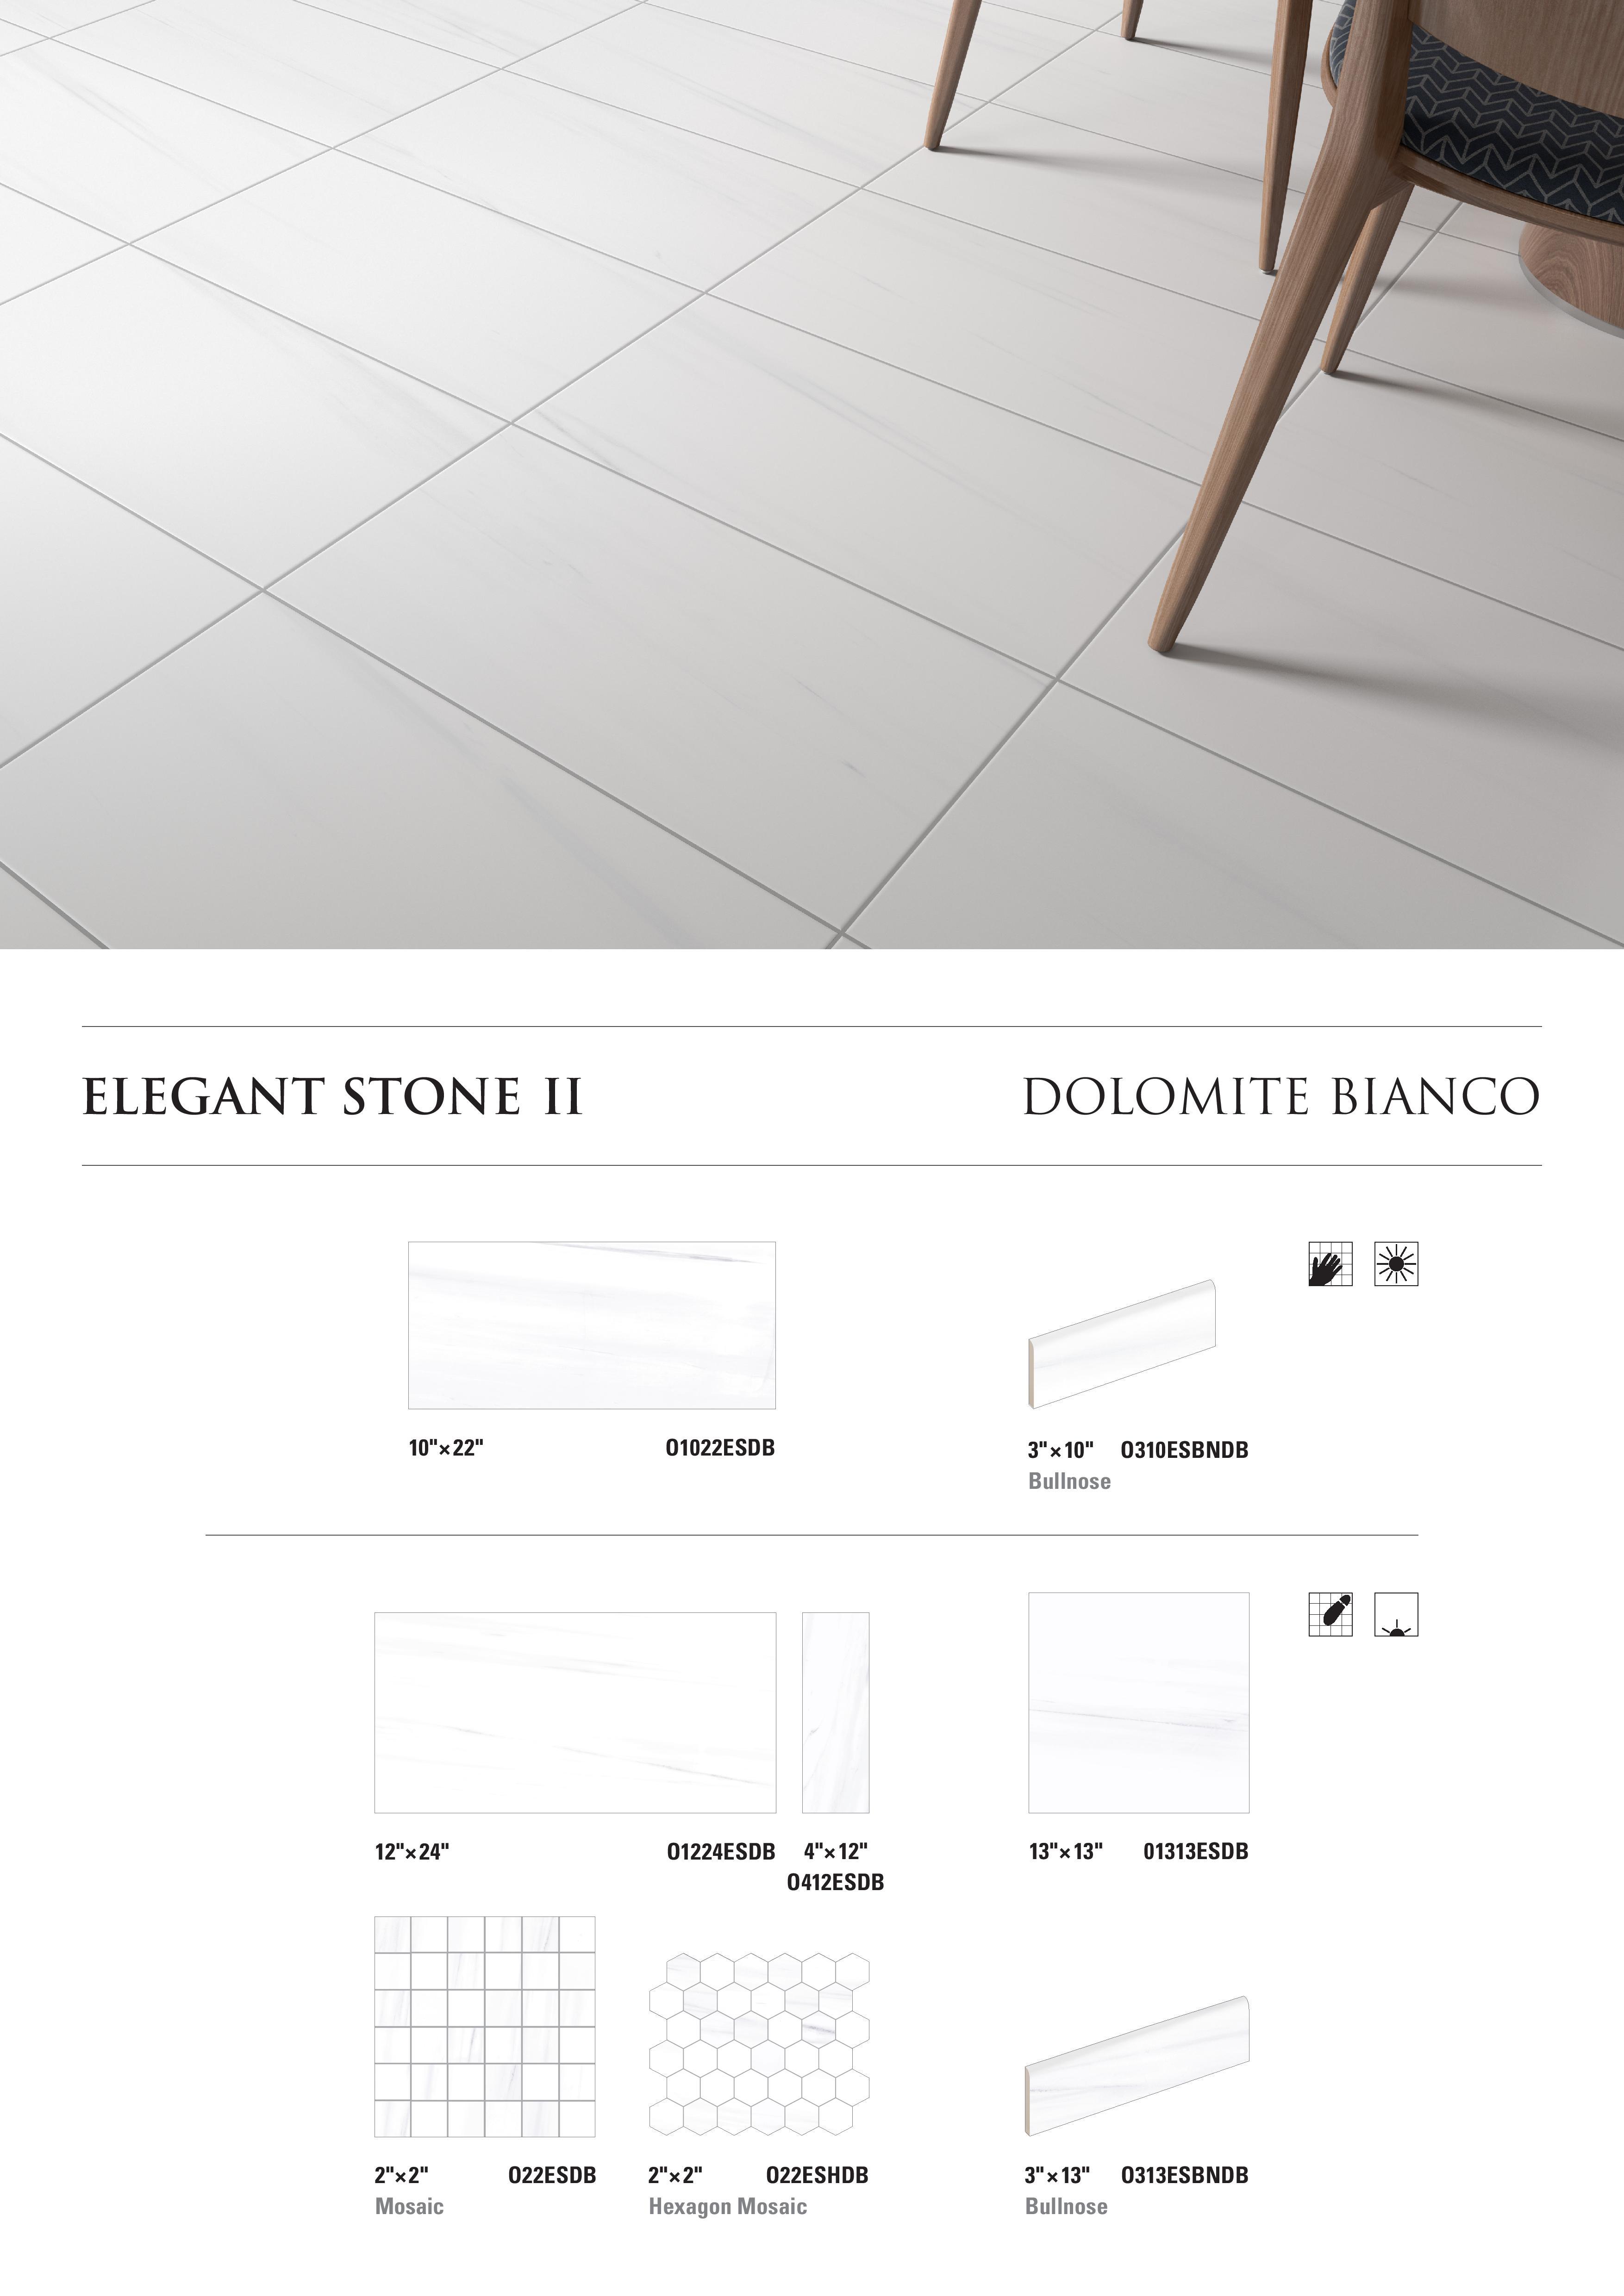 Elegant Stone II Dolomite Bianco by Opulenza at belktile.com